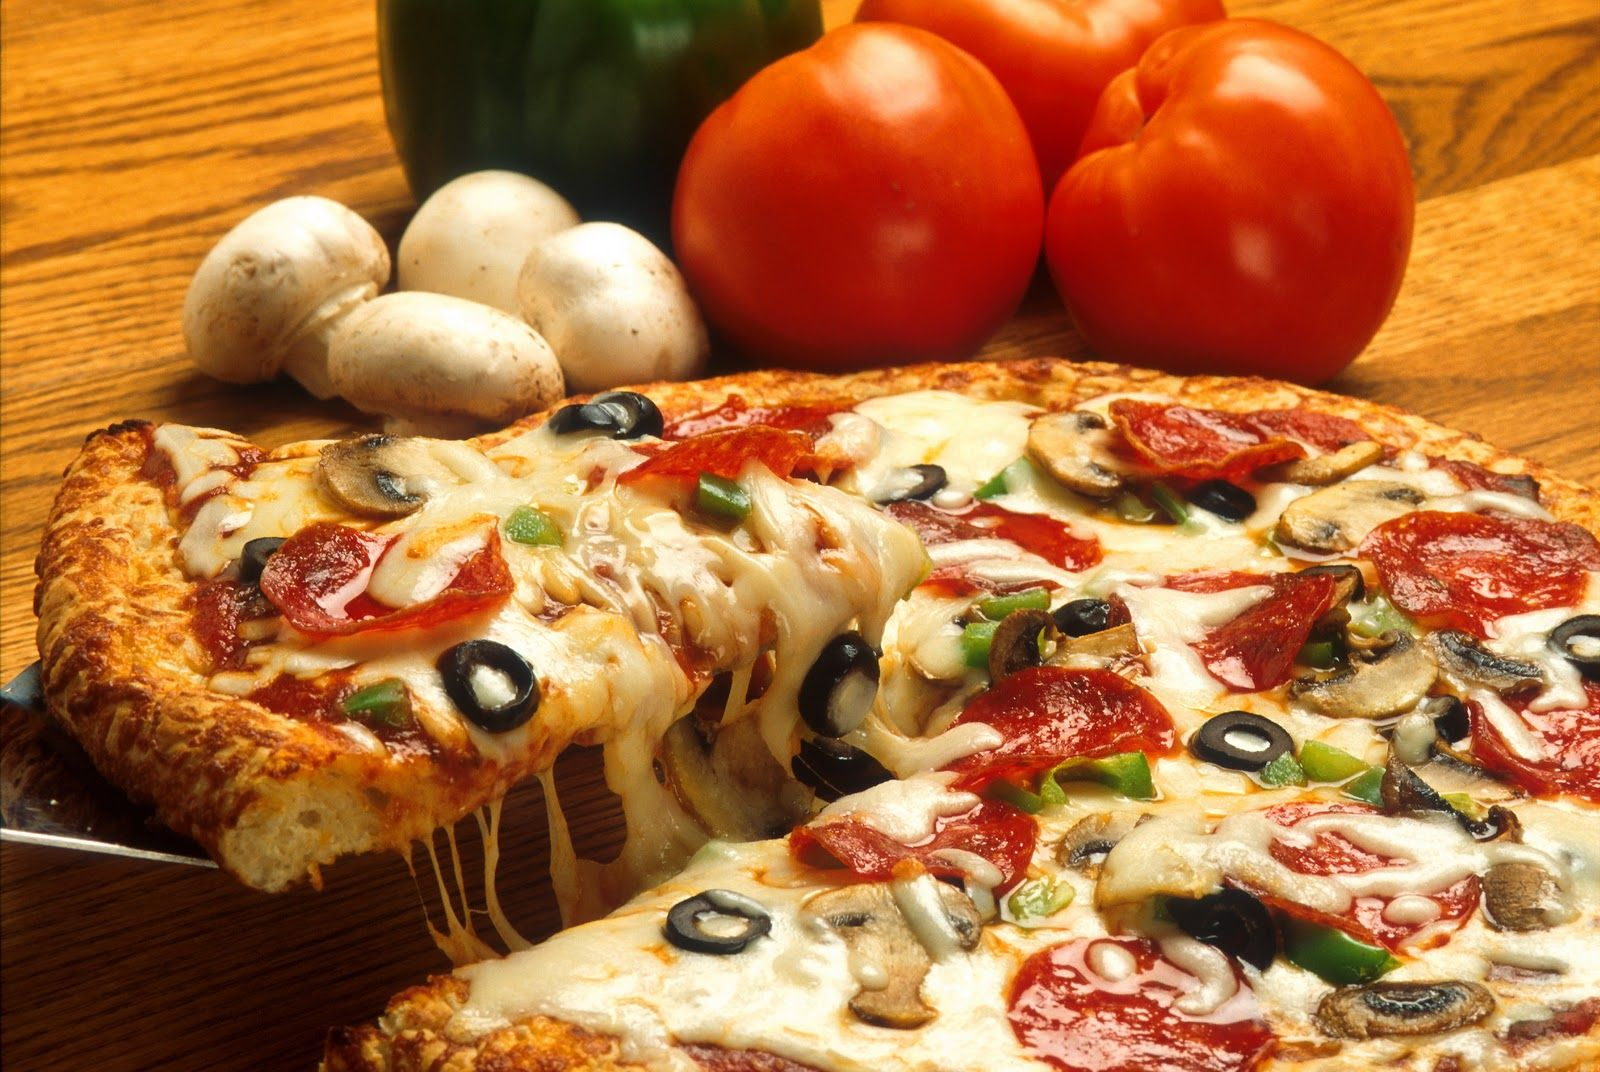 Pizza agli ortaggi:melenzane,peperoni......#Wonderfooditaly #FrancescoBruno